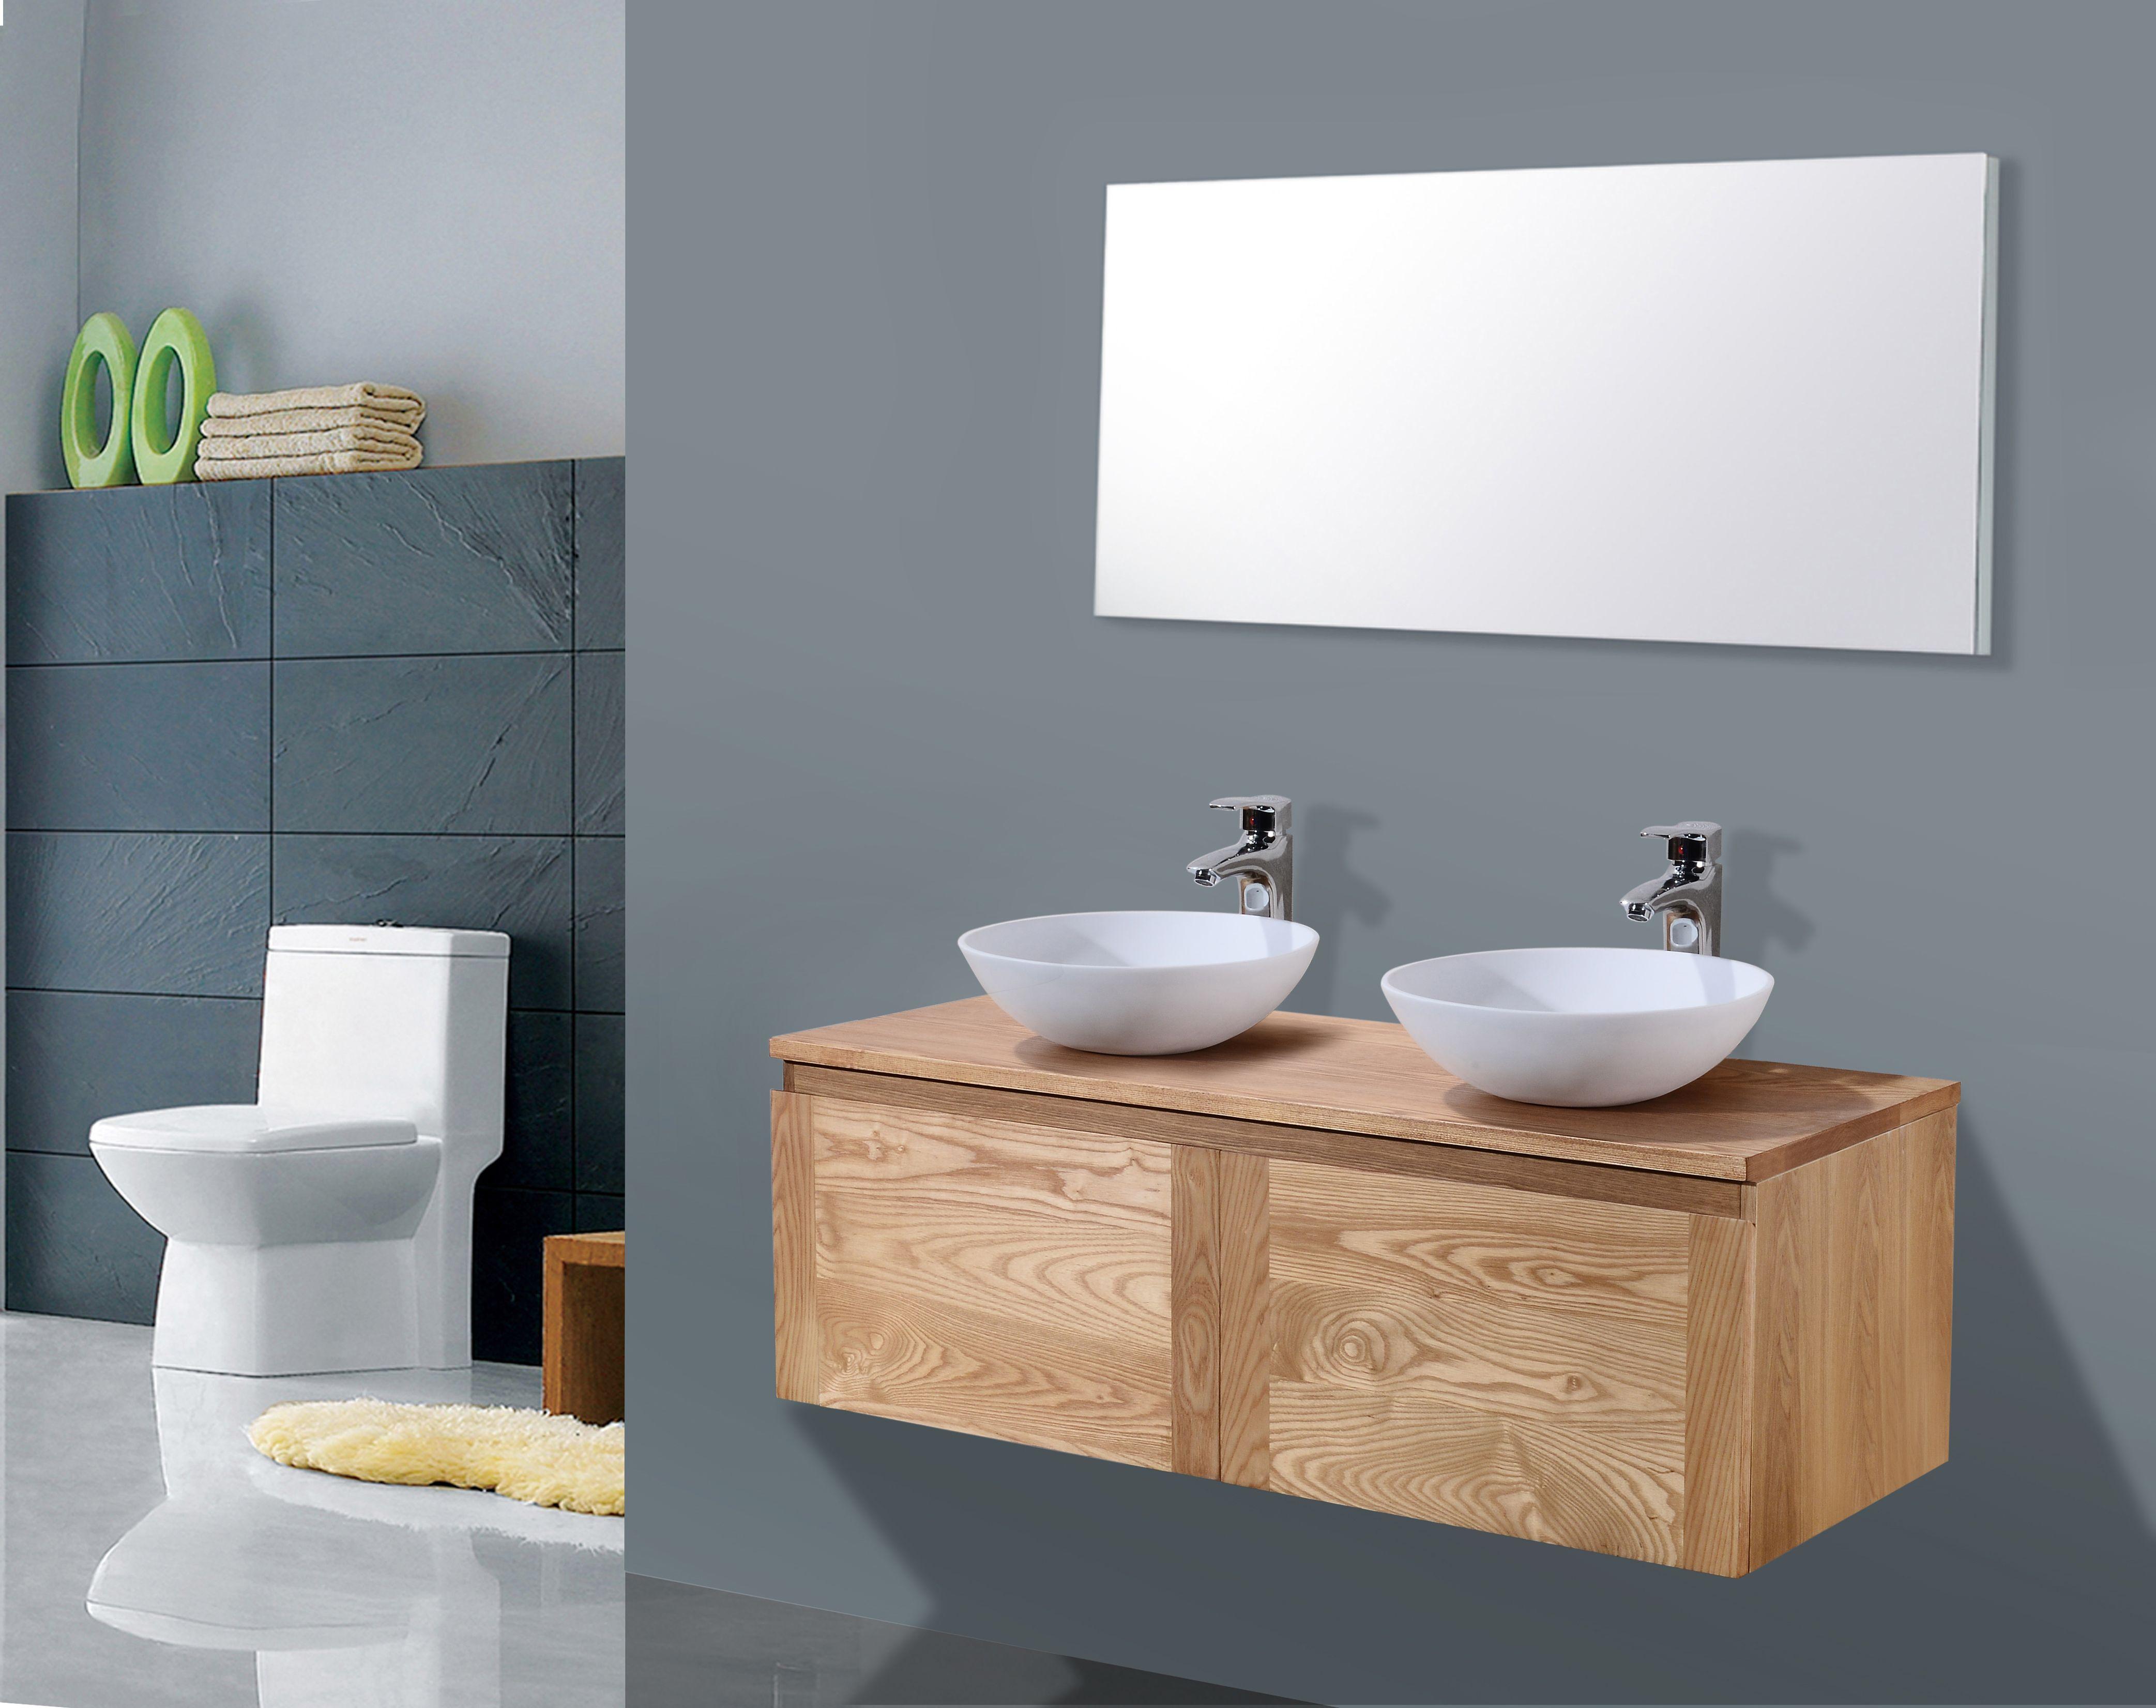 Houten Onderkast Badkamer : Badkamer accessoires lambini designs orion houten